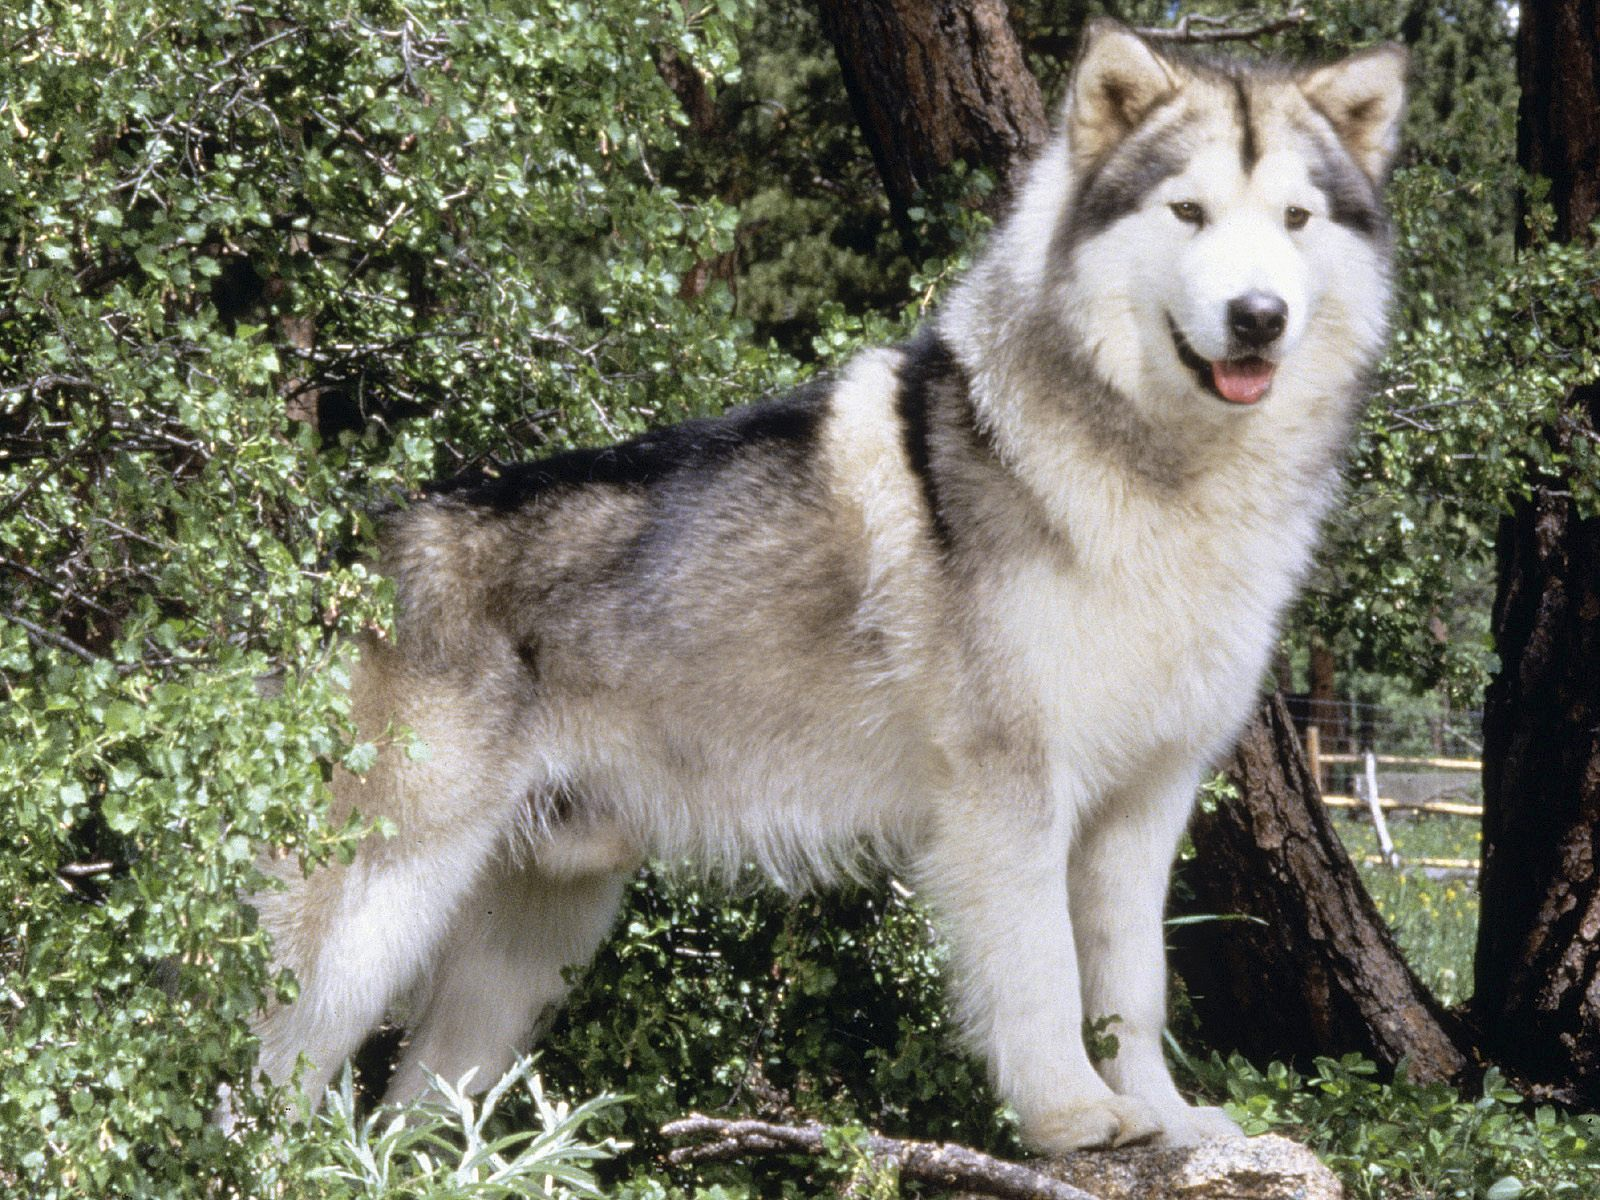 Alaskan Malamute - Pictures, Puppies, Diet, Breeding ...